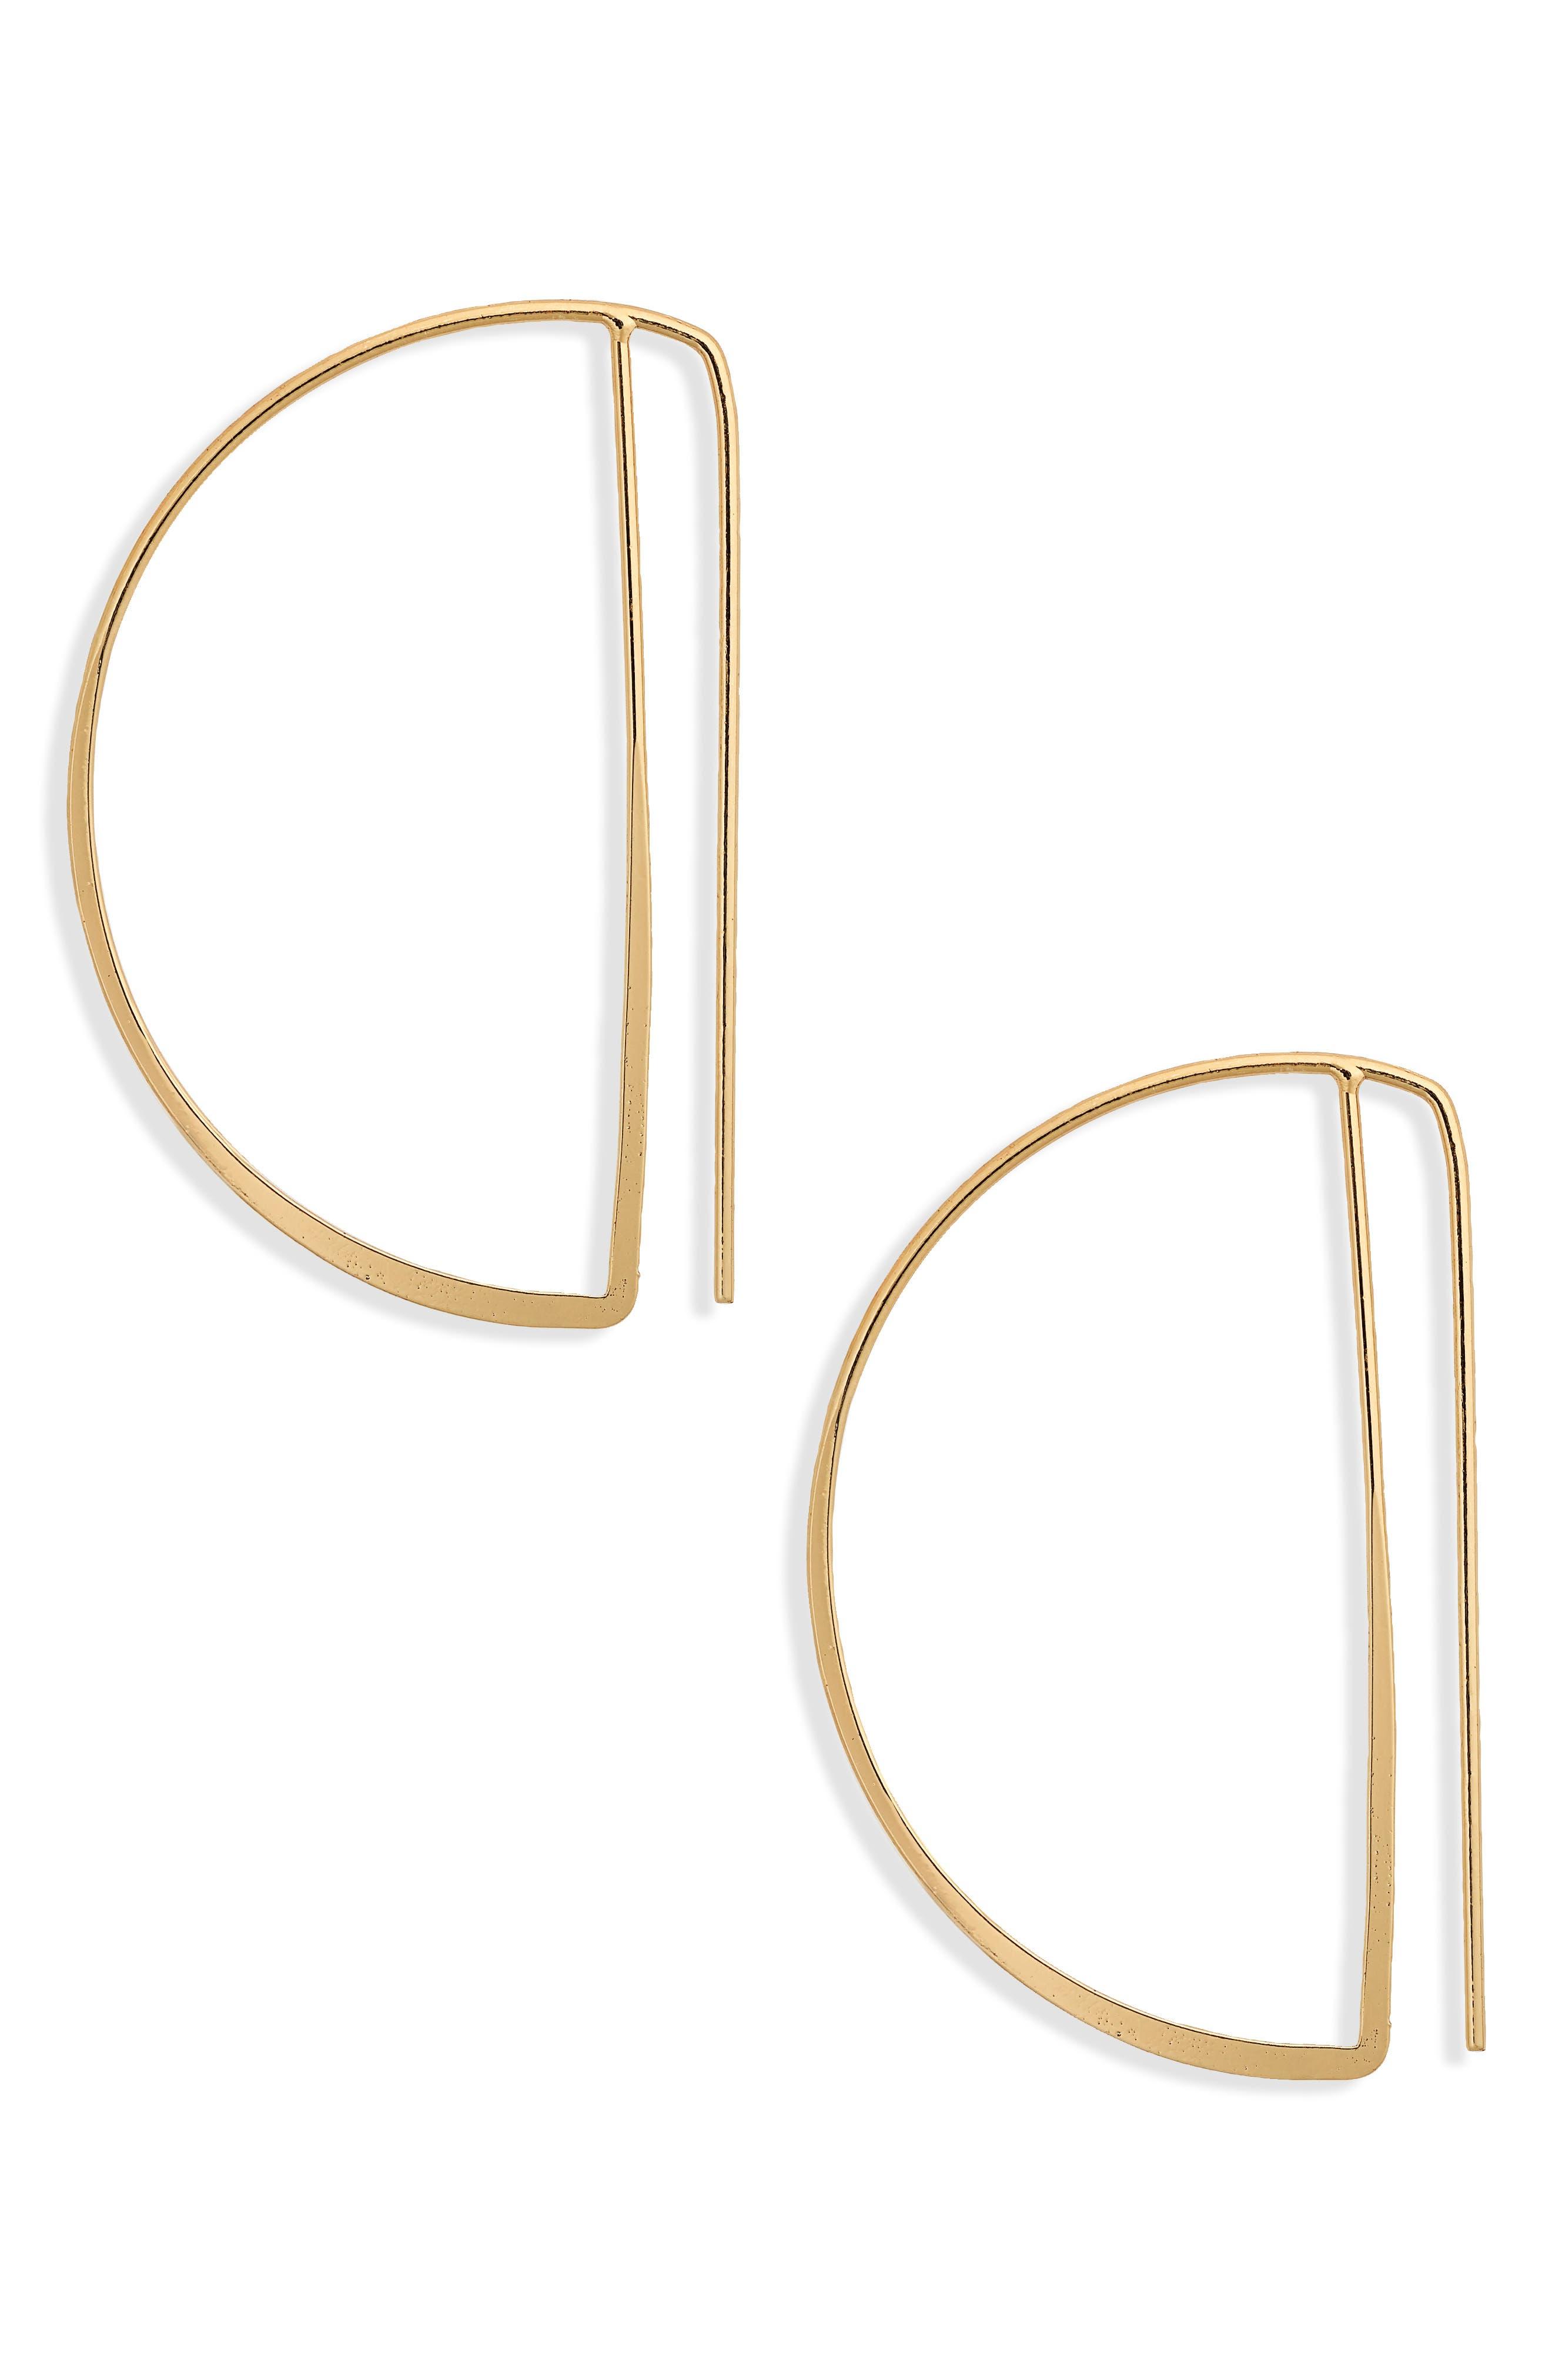 Geo Half Hoop Earrings,                             Main thumbnail 1, color,                             Gold